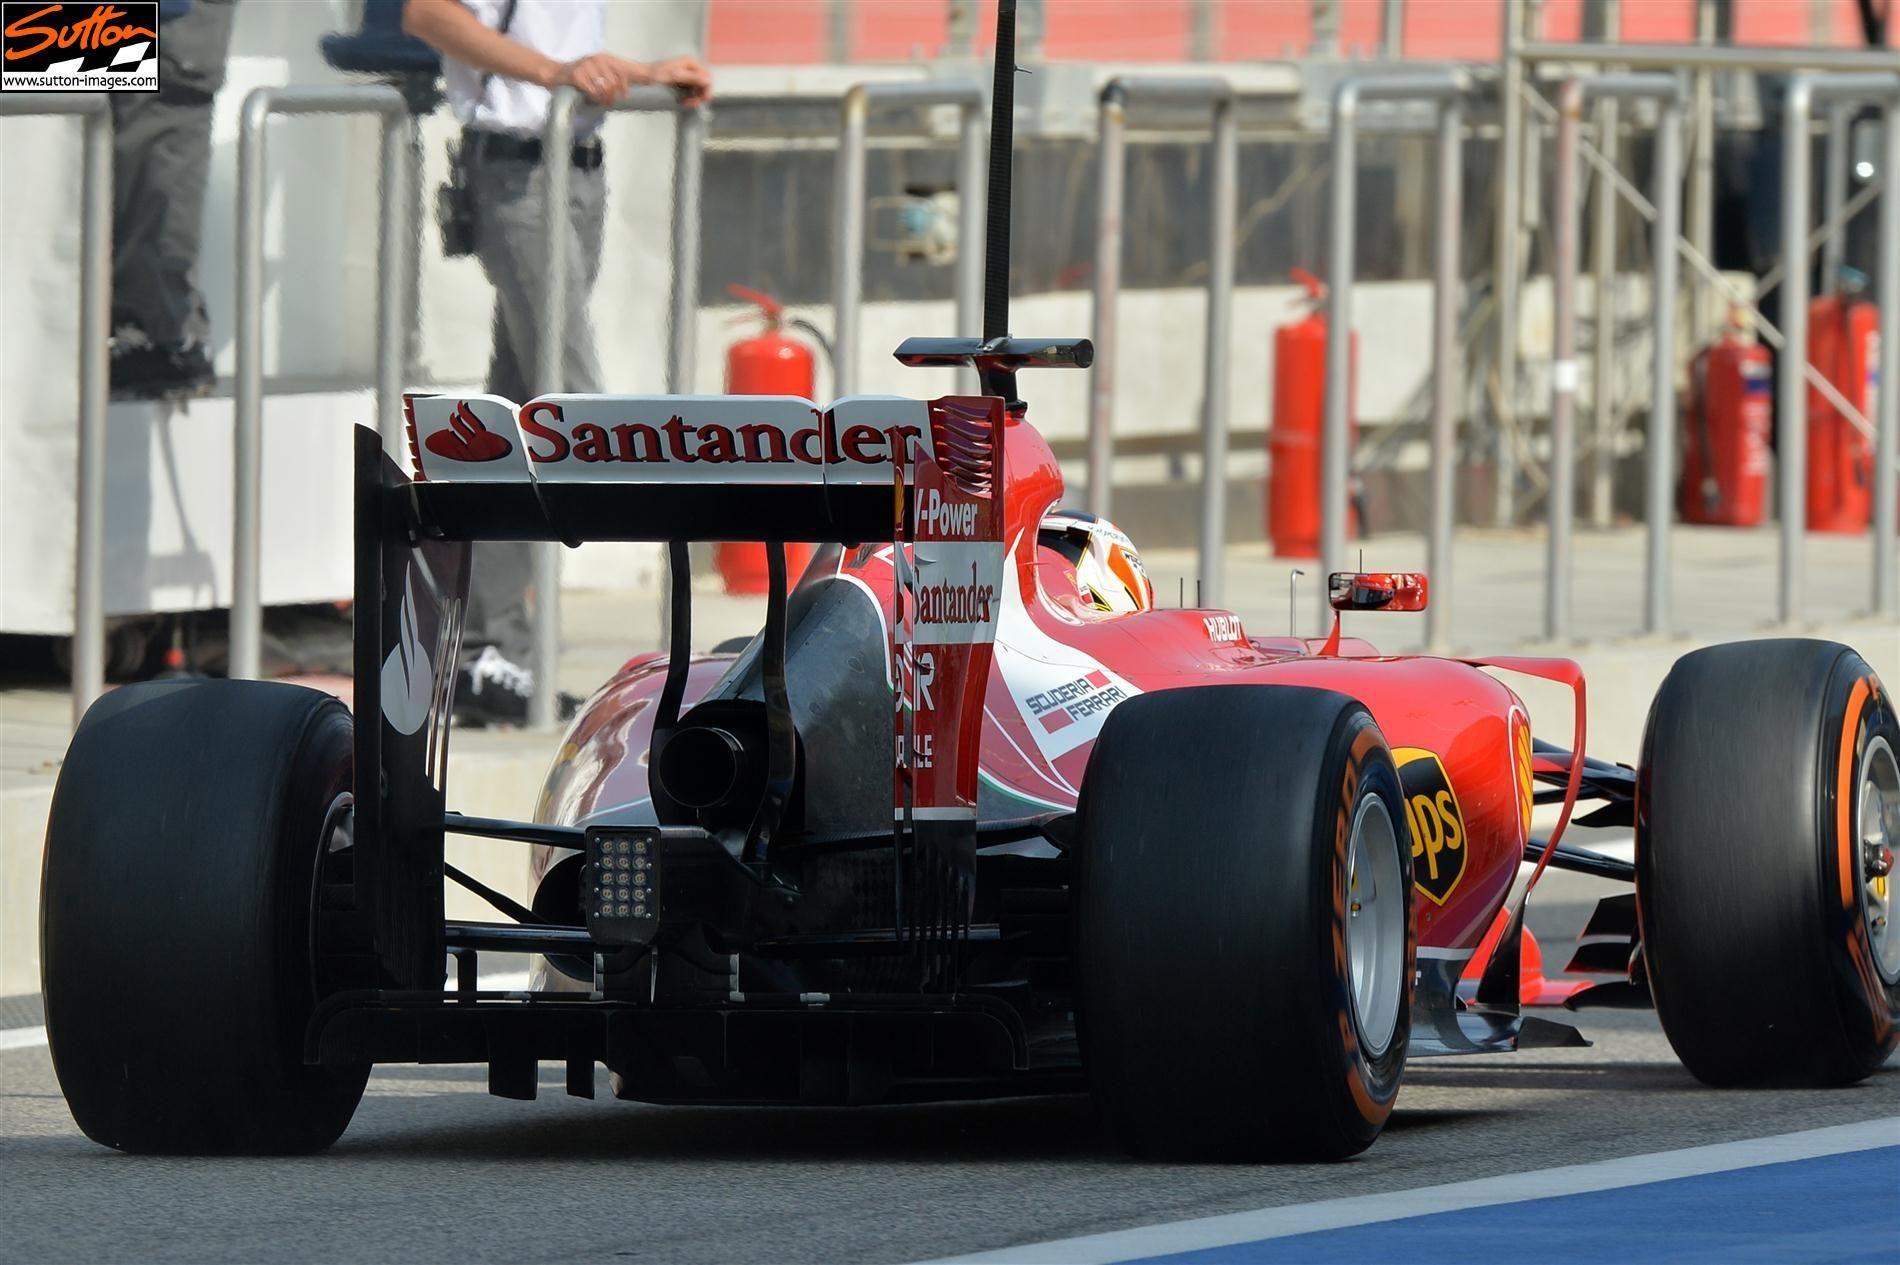 F1 2014 - Bahrain - Day 5 - Testing: Rear of the Ferrari